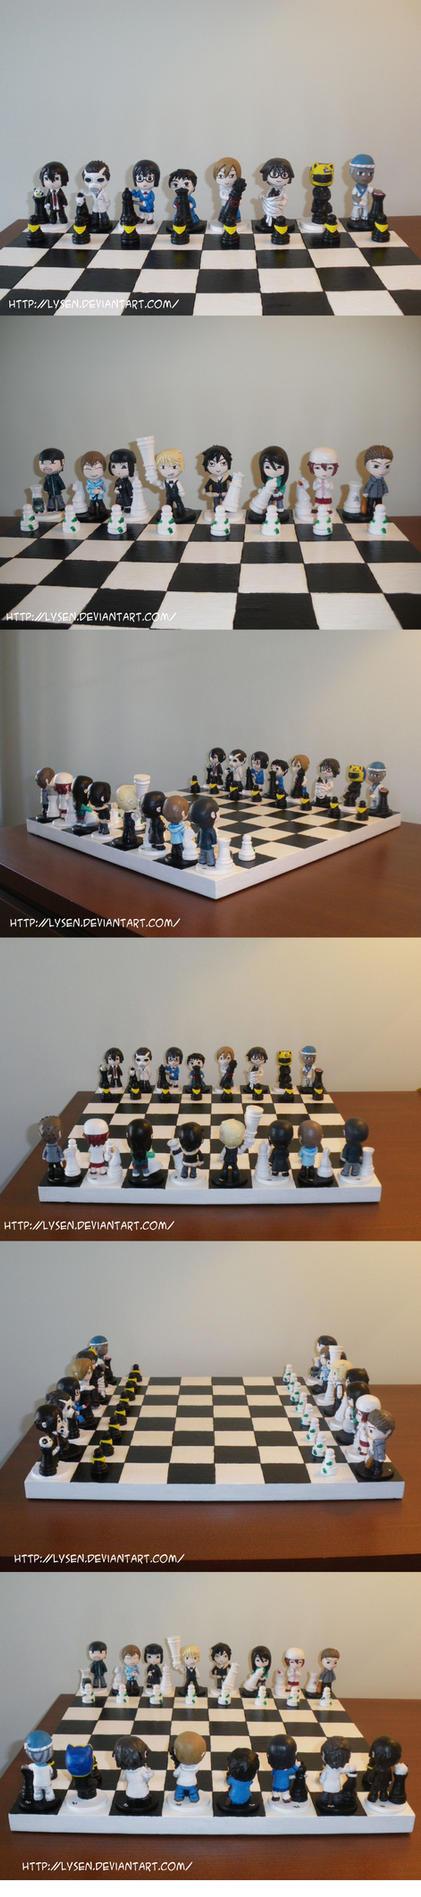 Durarara chess board by lysen